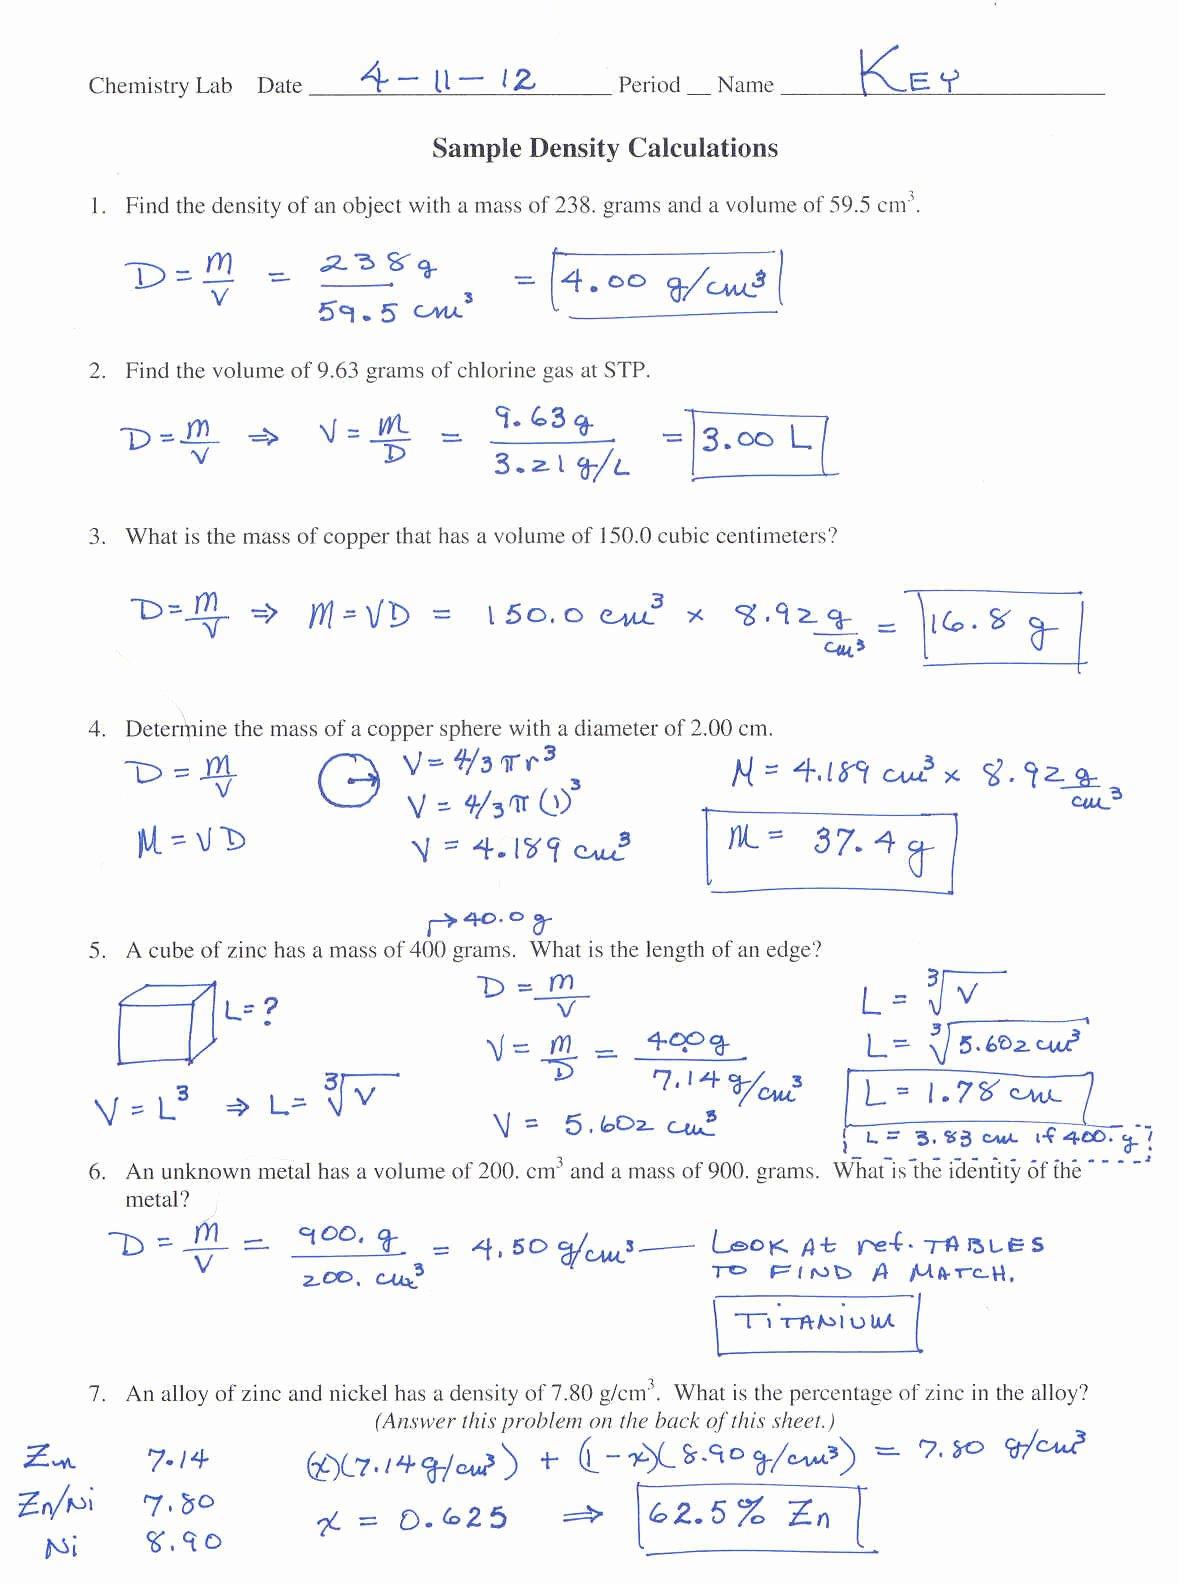 Worksheet Mole Problems Answers Awesome Mole Conversion Problems Worksheets with Answers